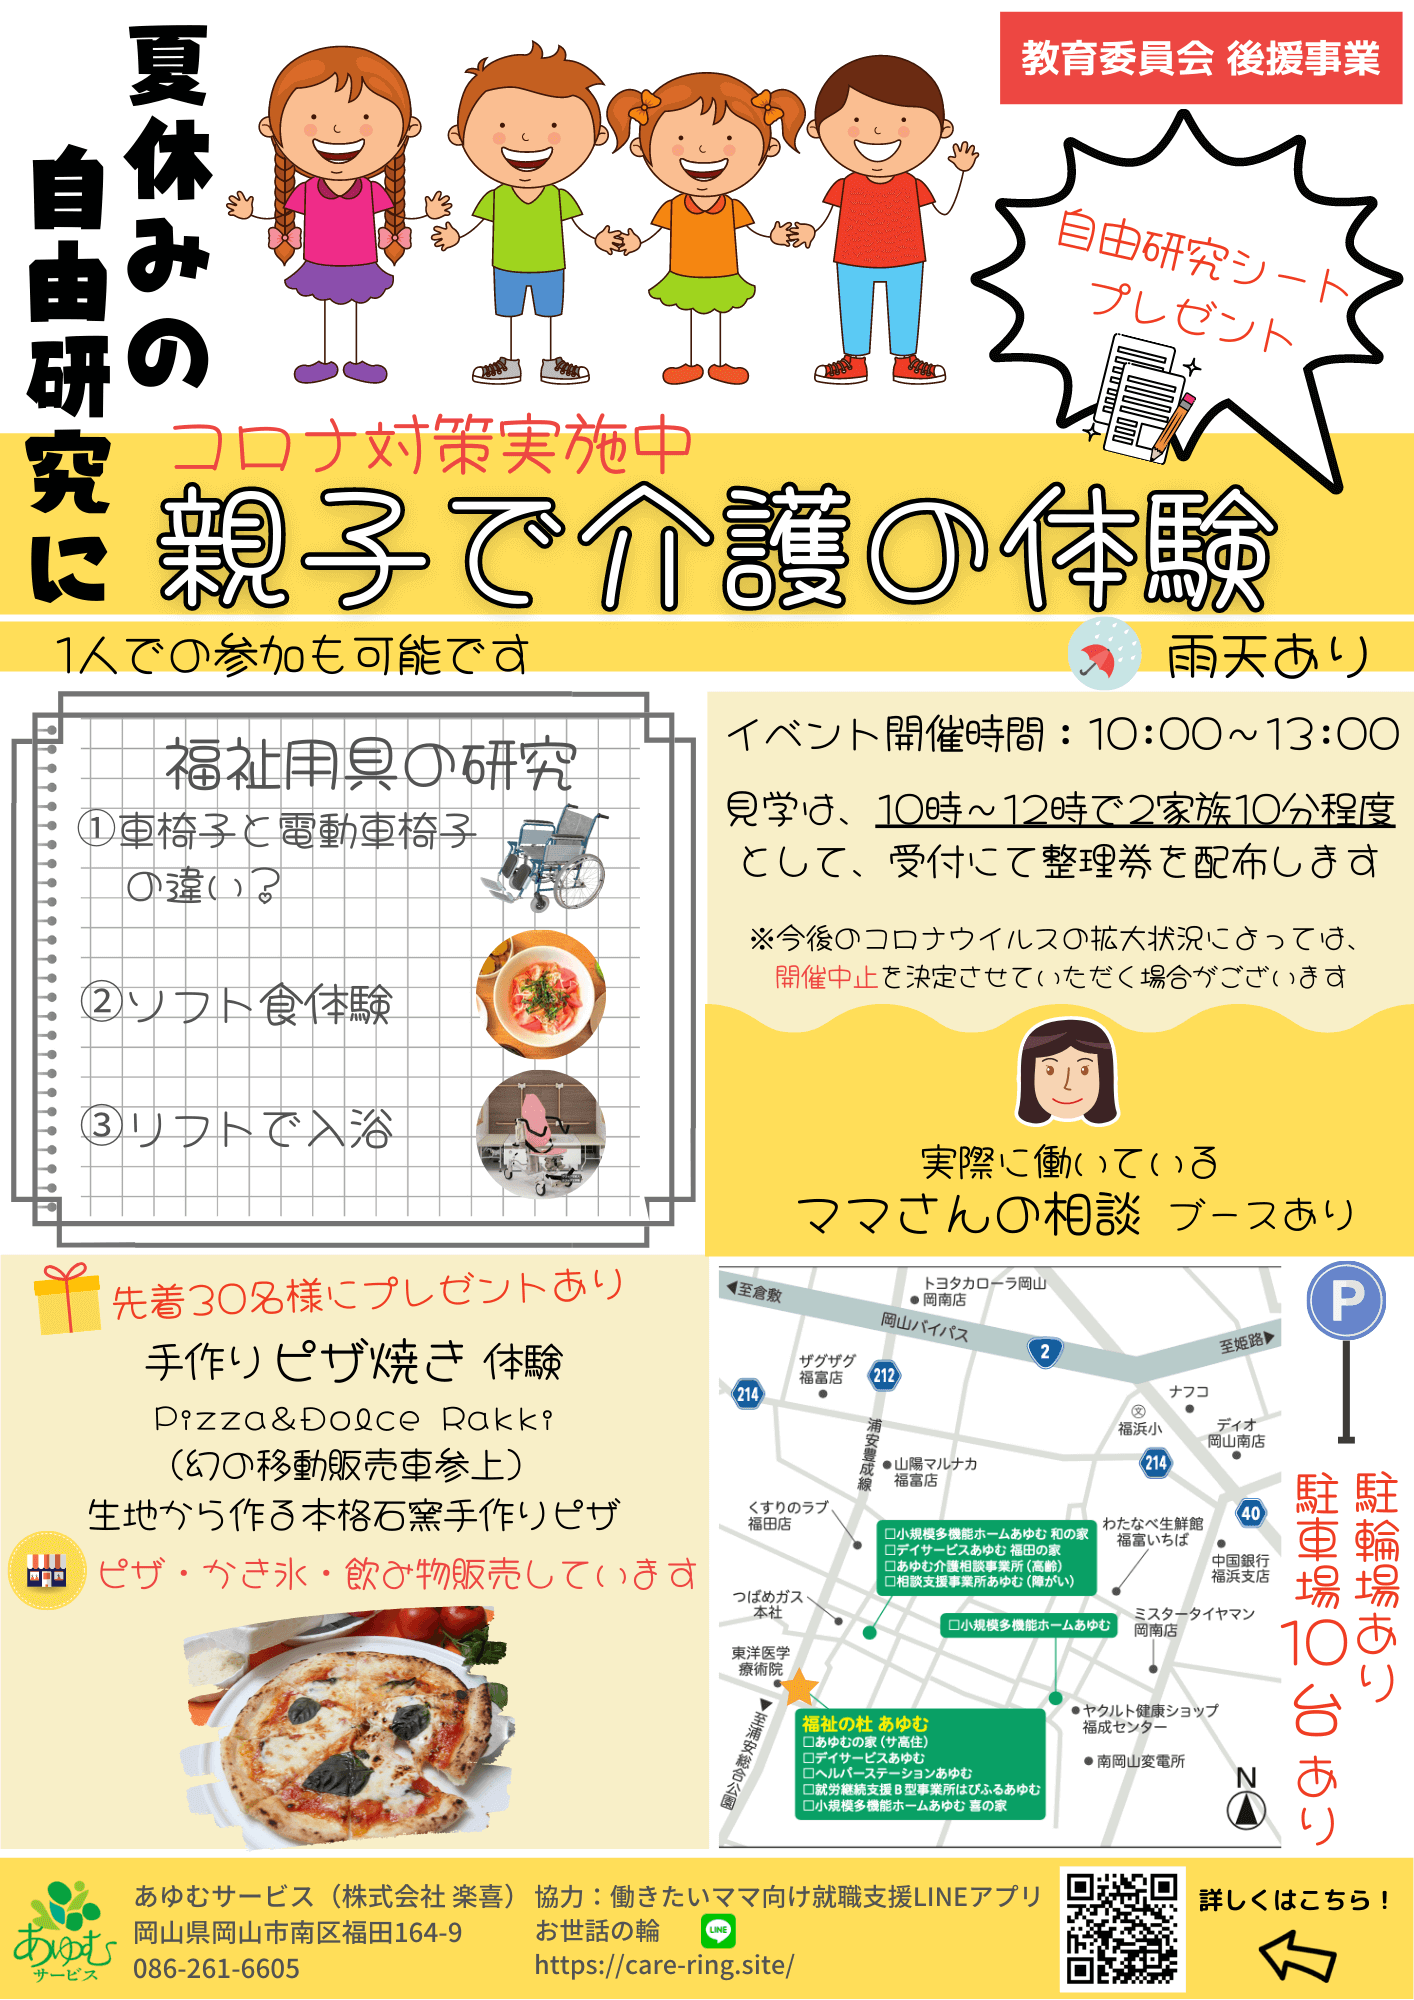 You are currently viewing 2021年7月31日開催!あゆむサービス様主催の親子イベントをご紹介